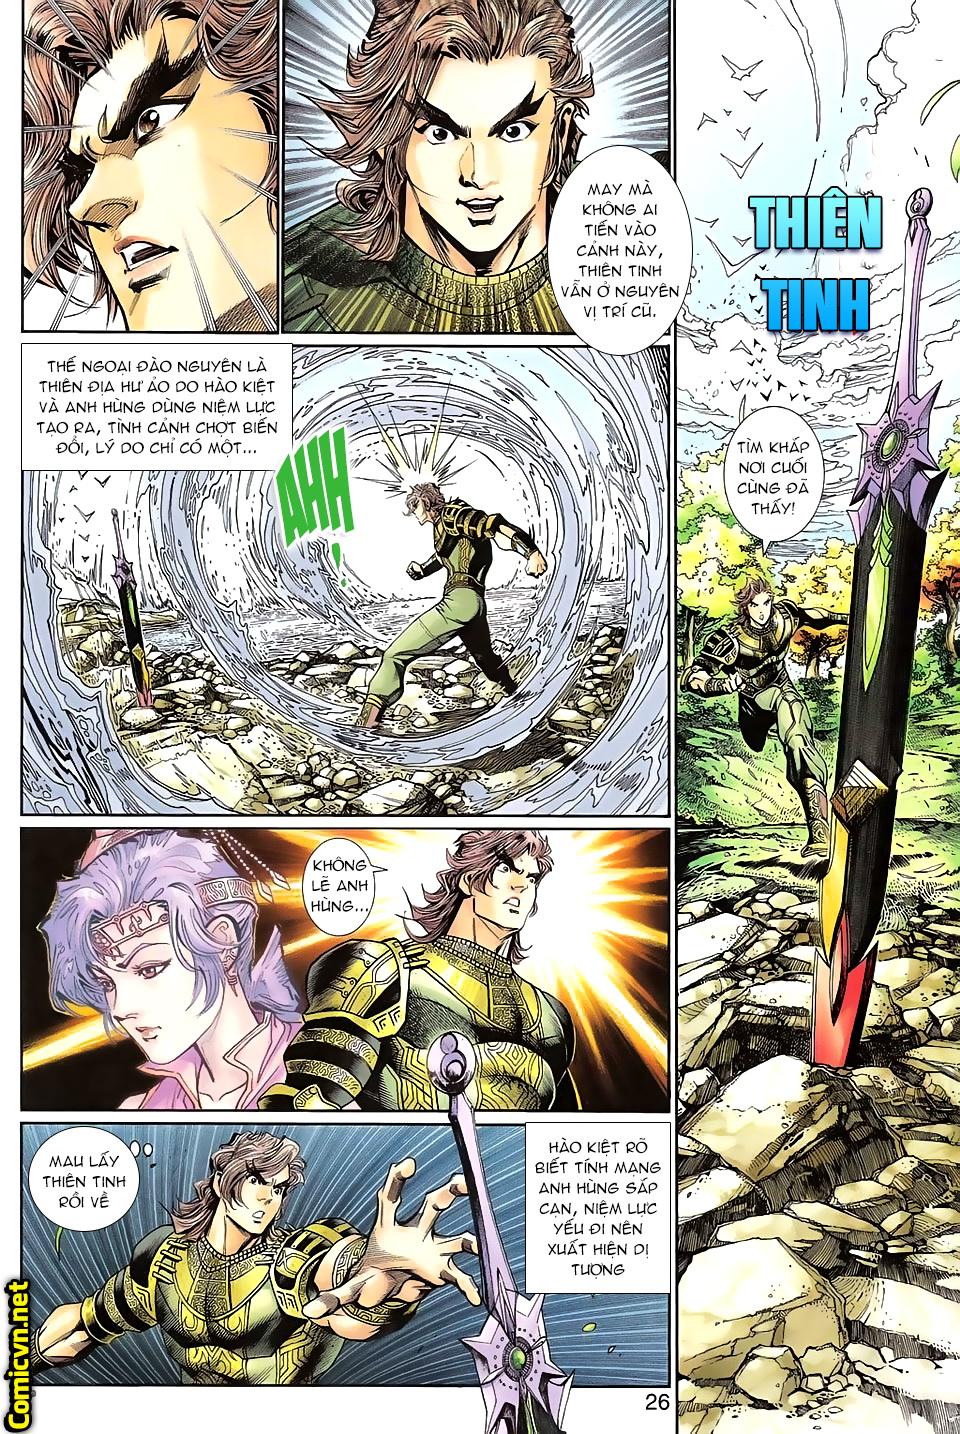 Thần binh huyền kỳ 3 - 3.5 Chapter 89 - Hamtruyen.vn